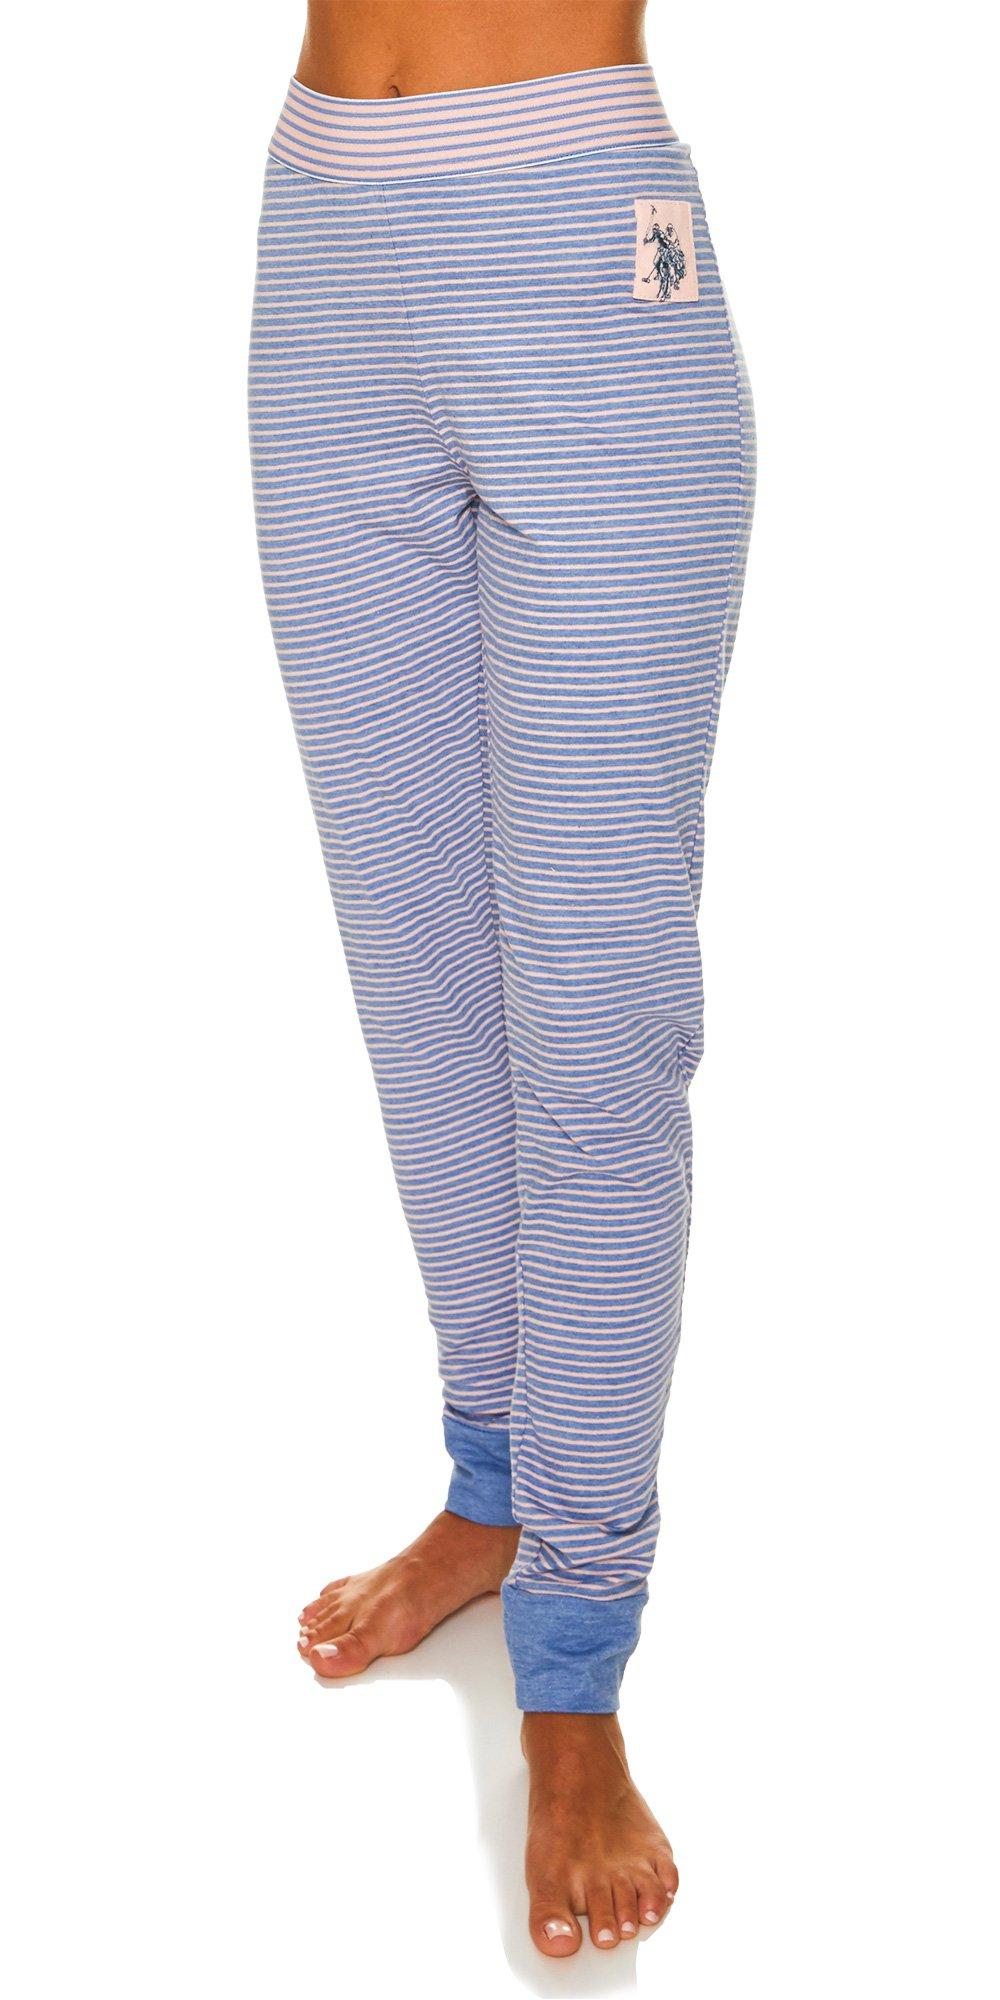 U.S. Polo Assn.. Womens Lounge Pajama Sleep Pants Light Denim Heather Large